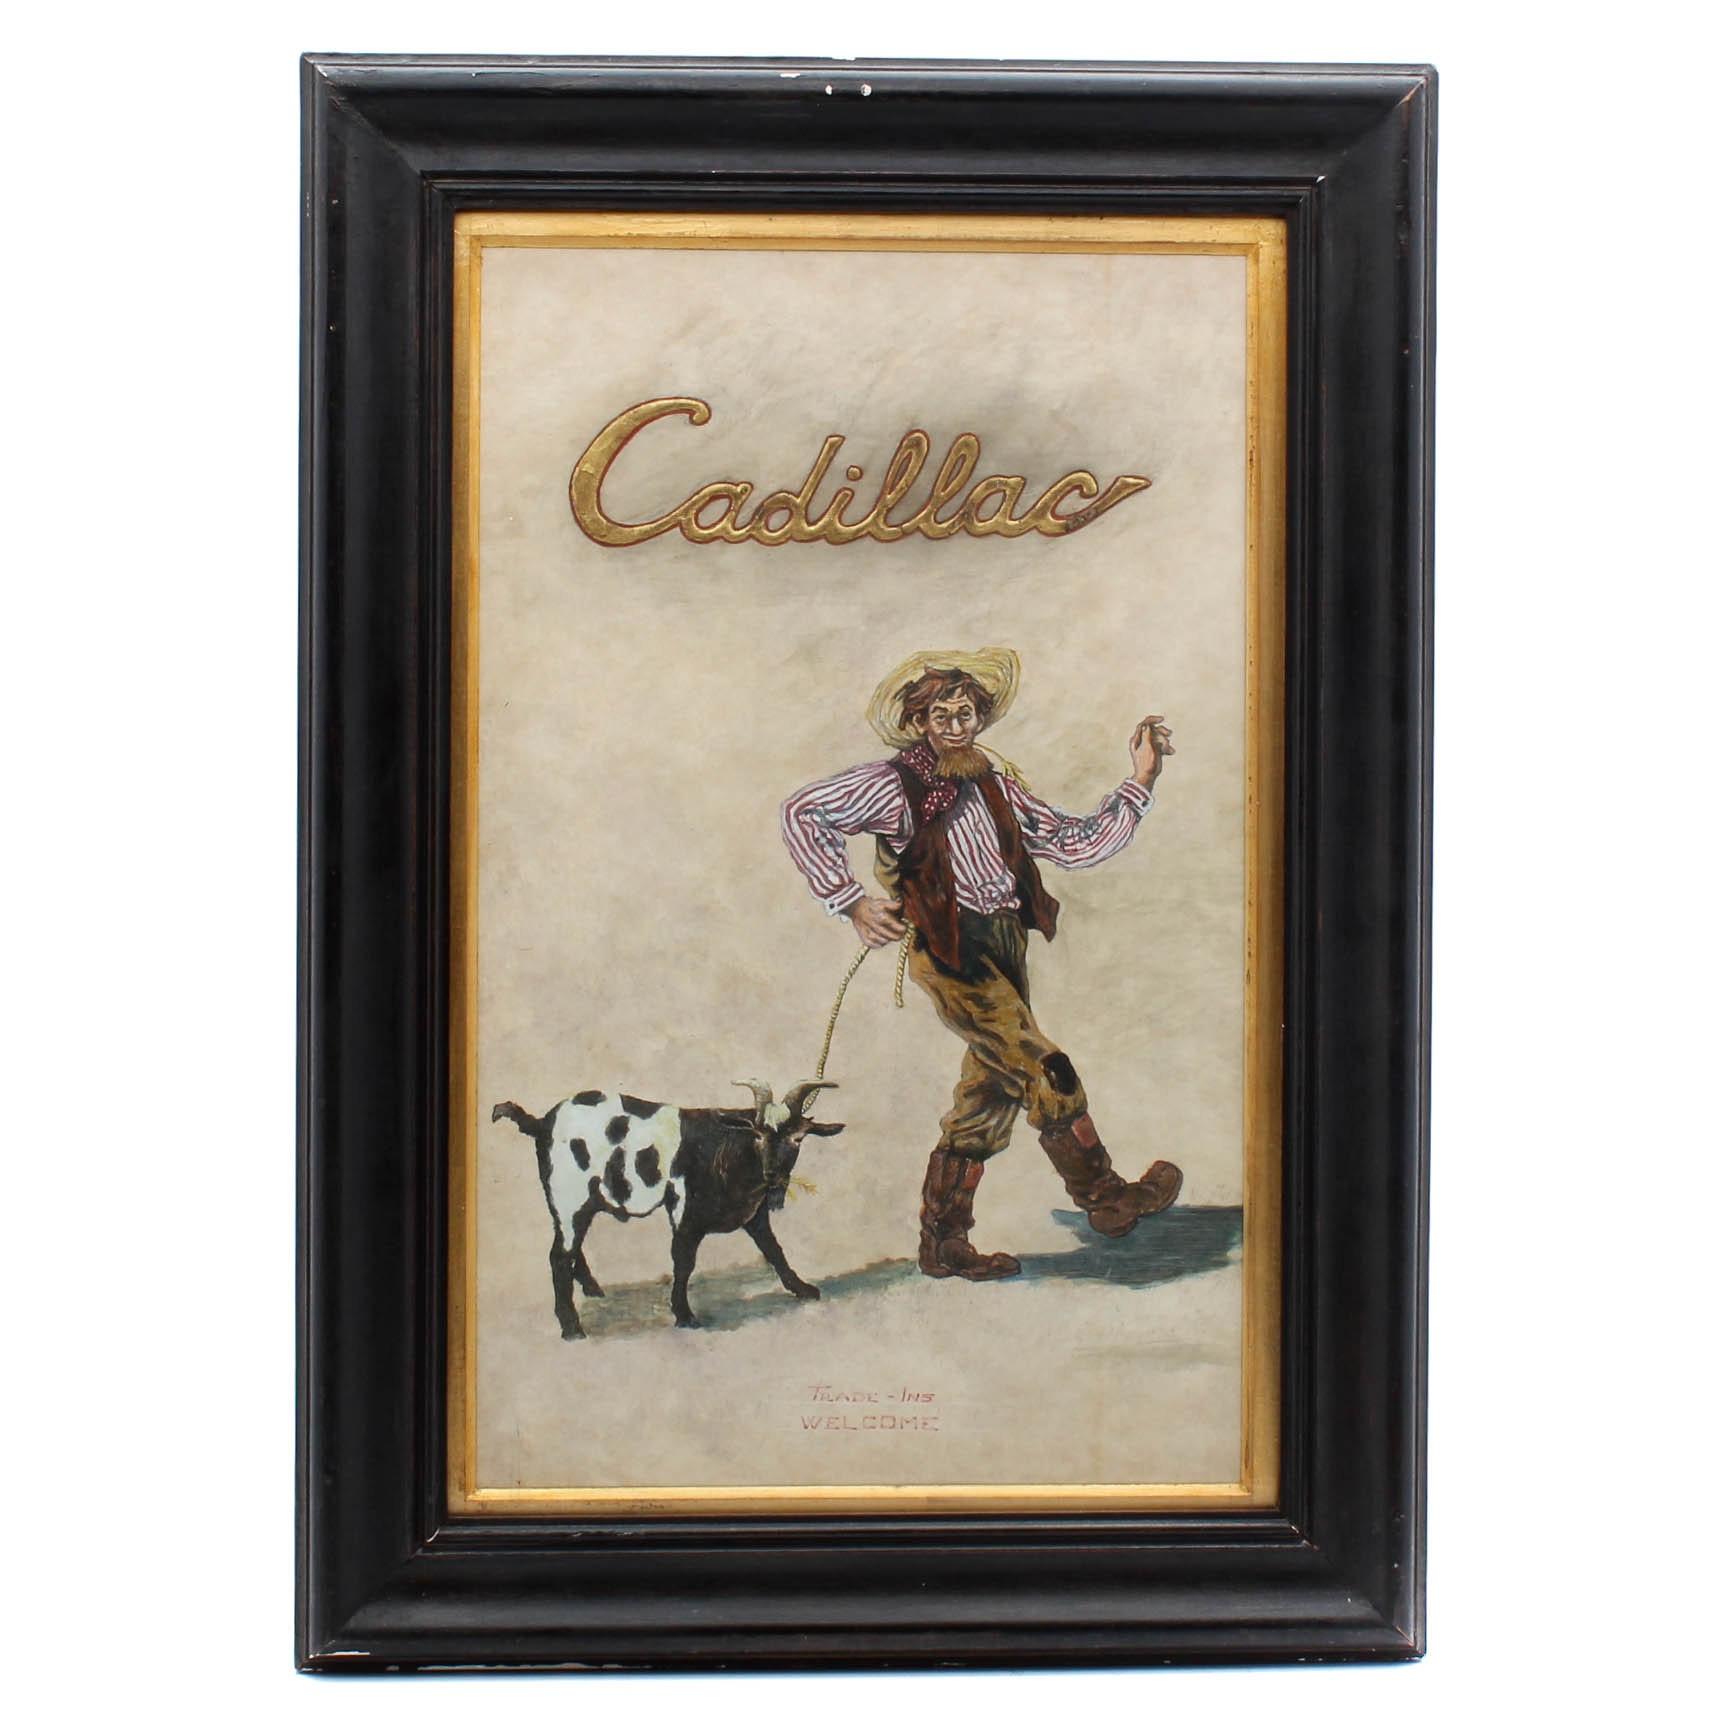 Cadillac Original Artwork for Ad